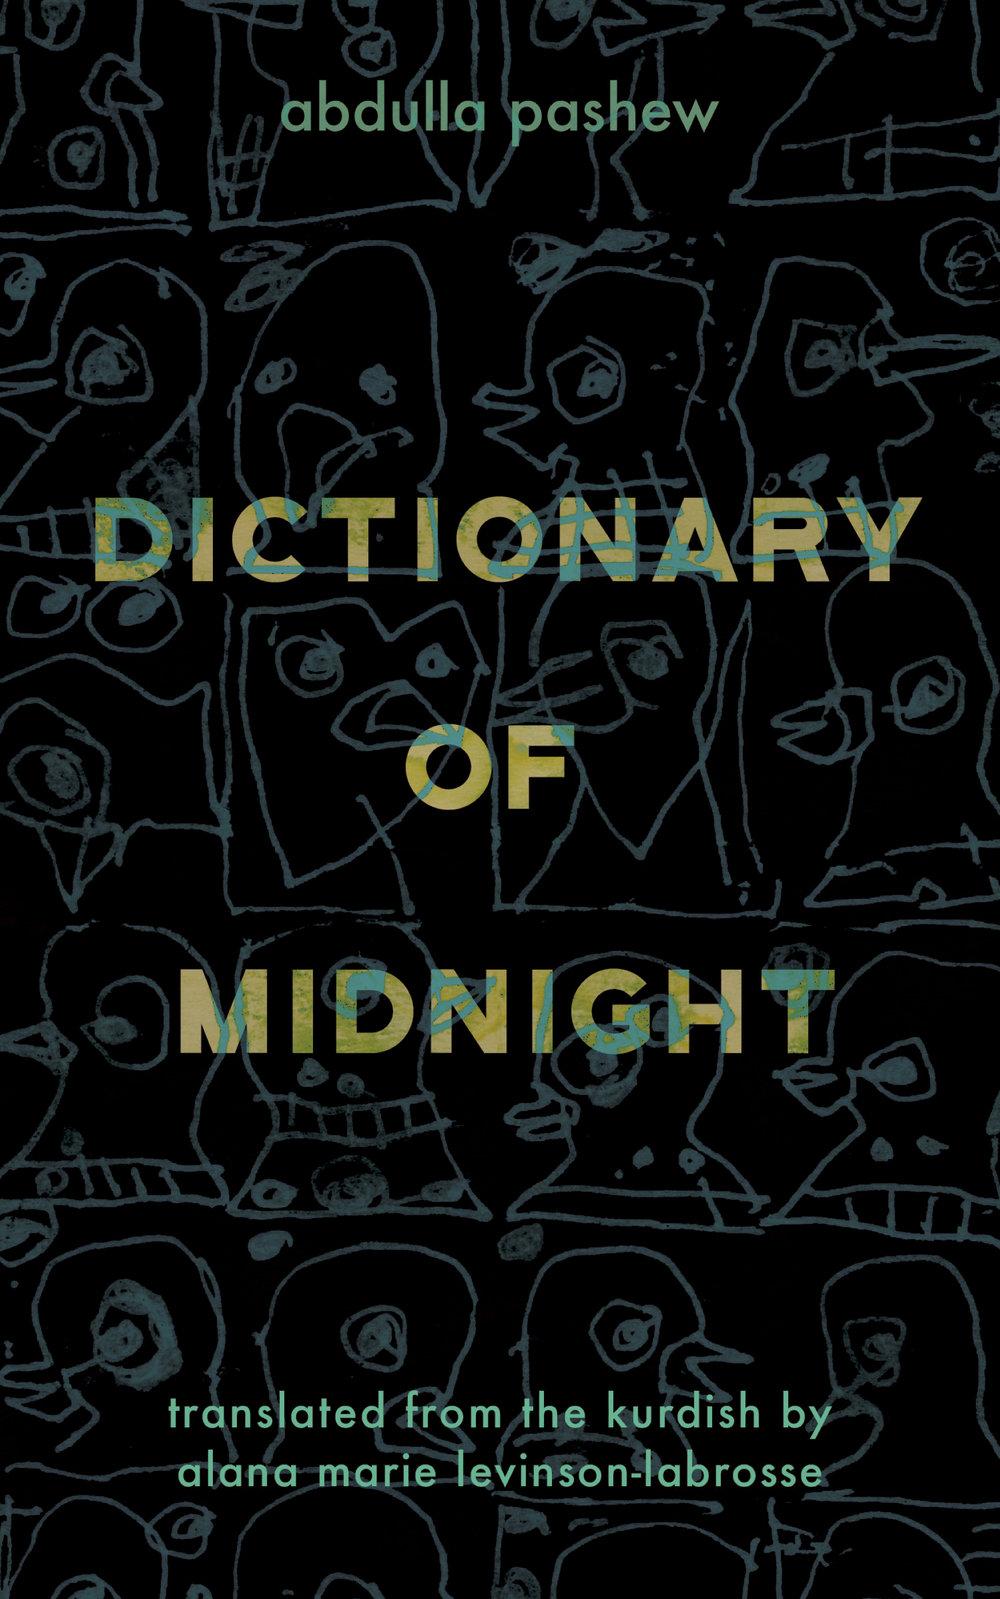 dating naked book not censored no blurs men lyrics meaning dictionary lyrics